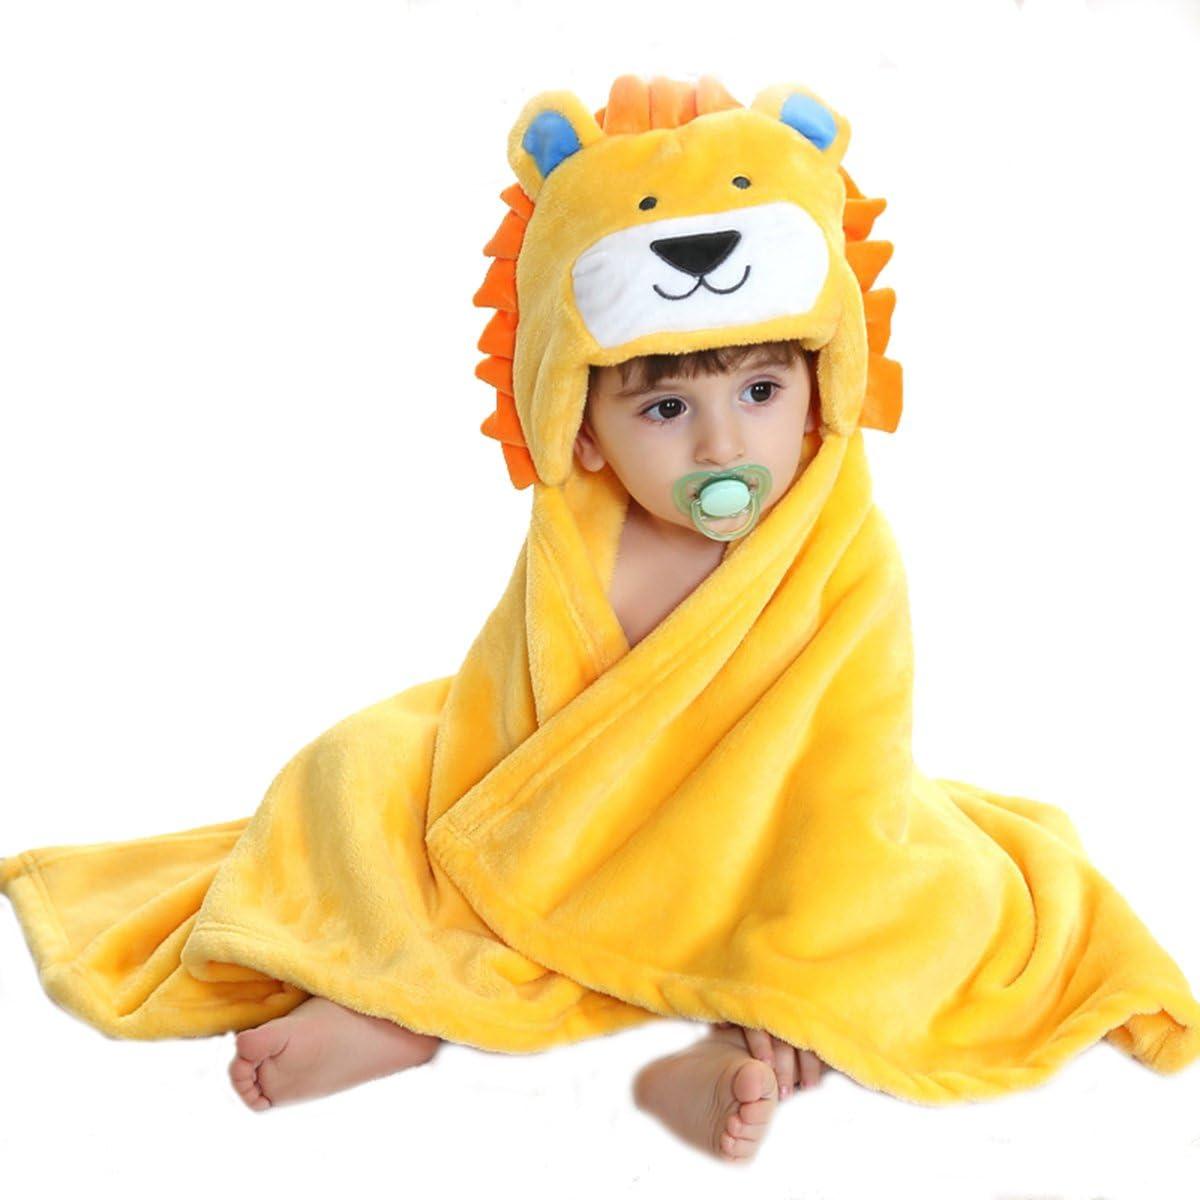 DEBAIJIA Infantil Albornoz 0-14T Beb/é Bata de Ba/ño Reci/én Nacido Casa Noche Ropa de Dormir Ni/ños Pijama Camisones Ni/ño Ni/ña Unisexo Franela